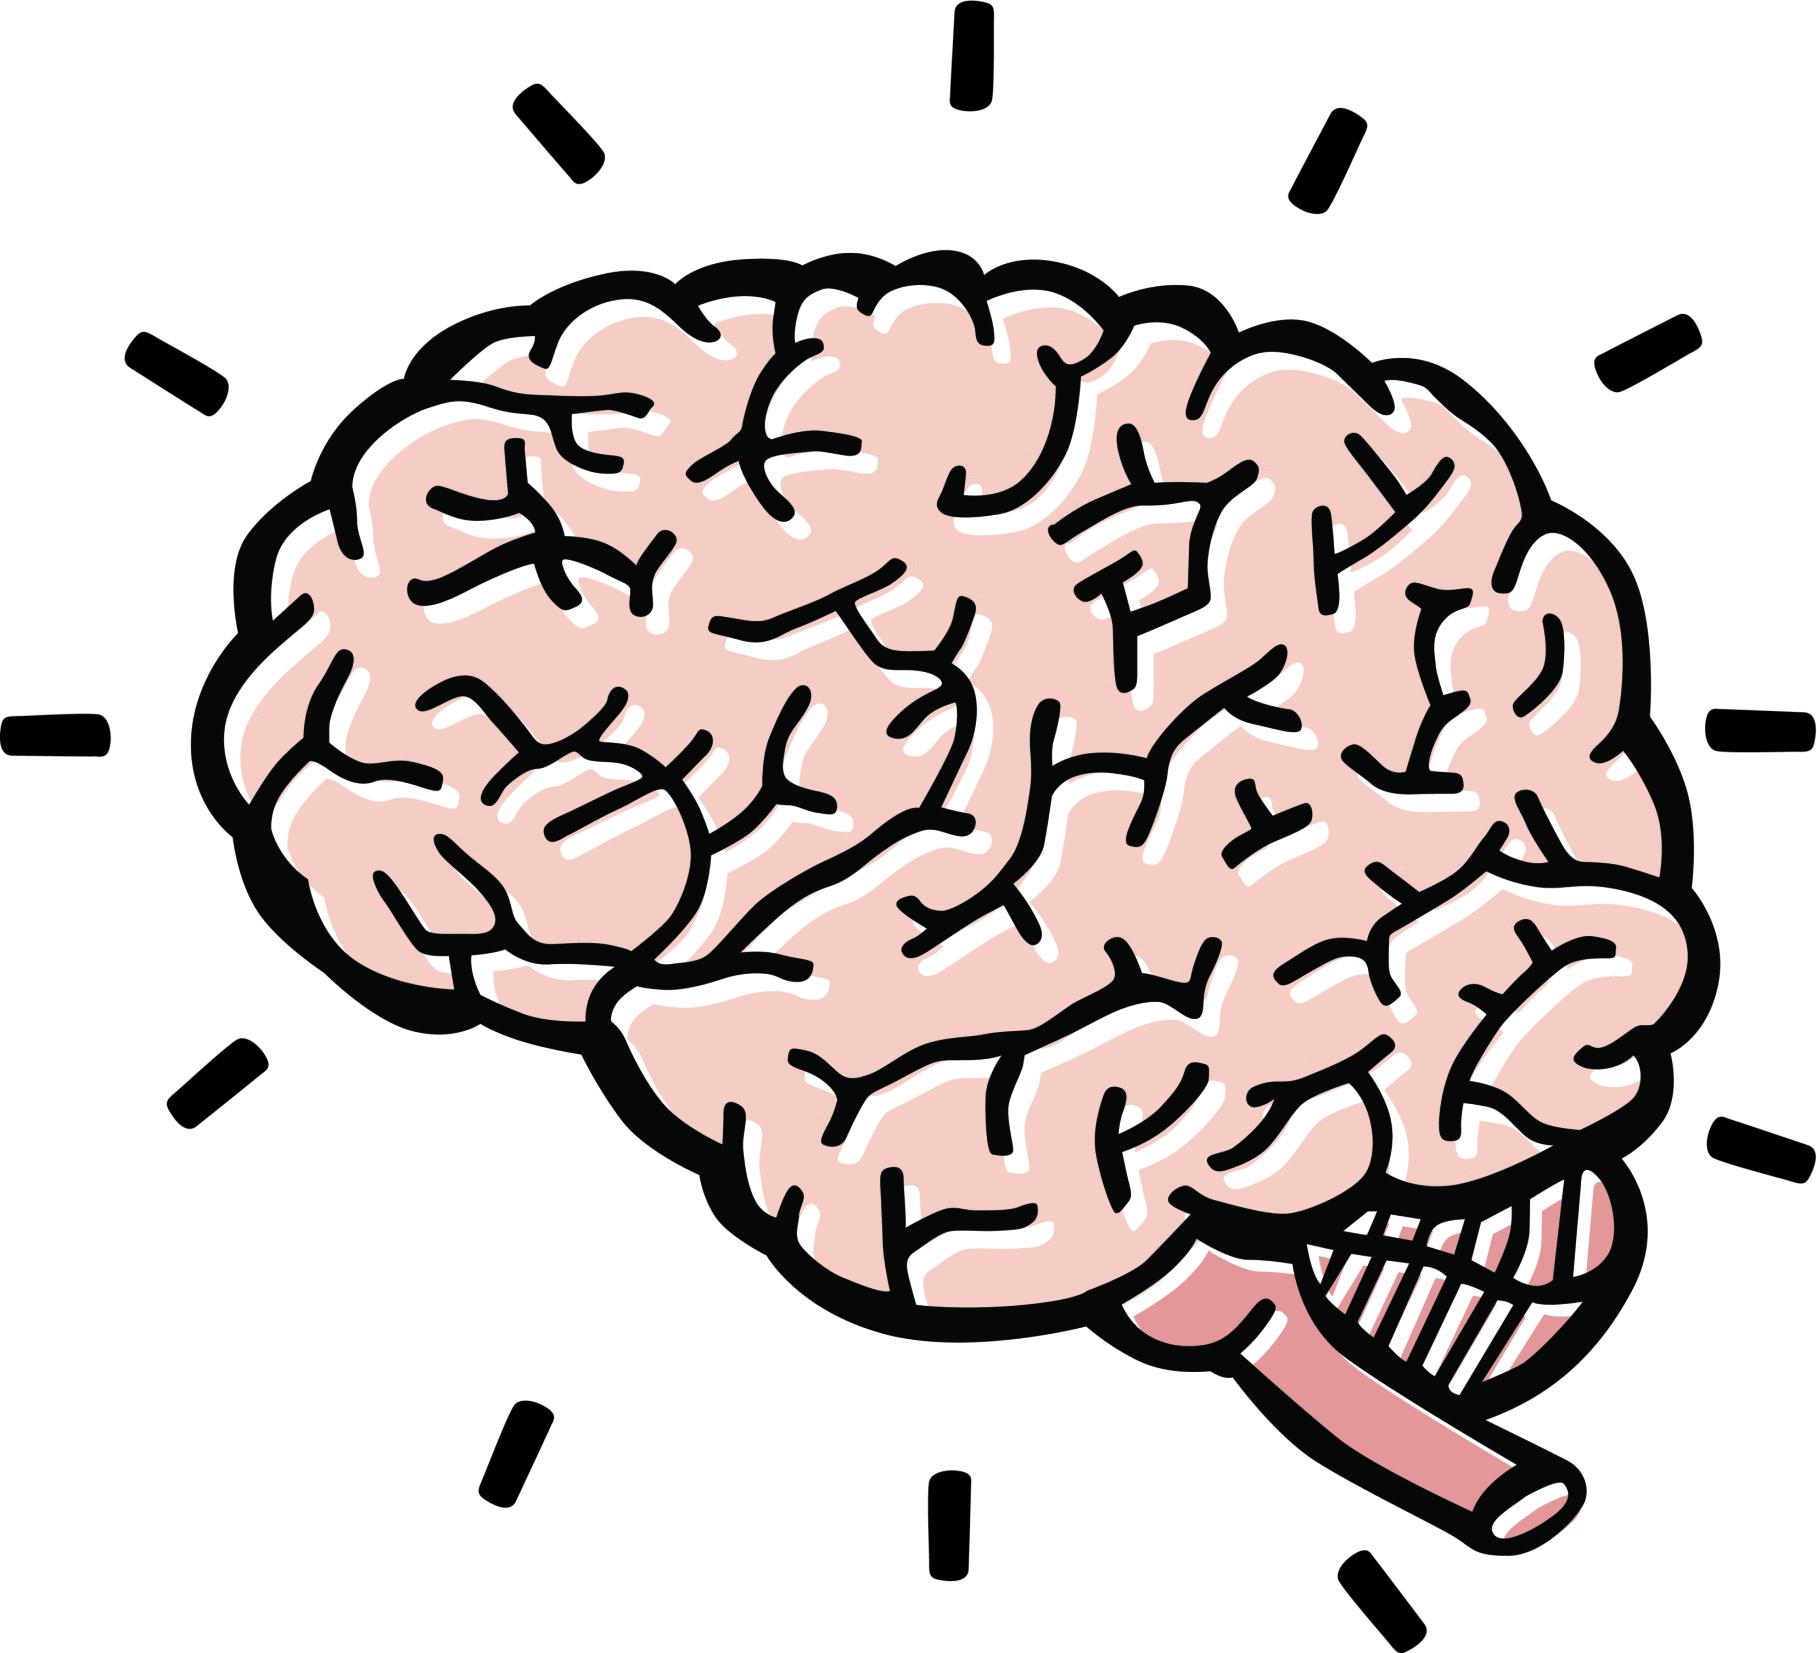 hight resolution of brain clipart 4 clipartix